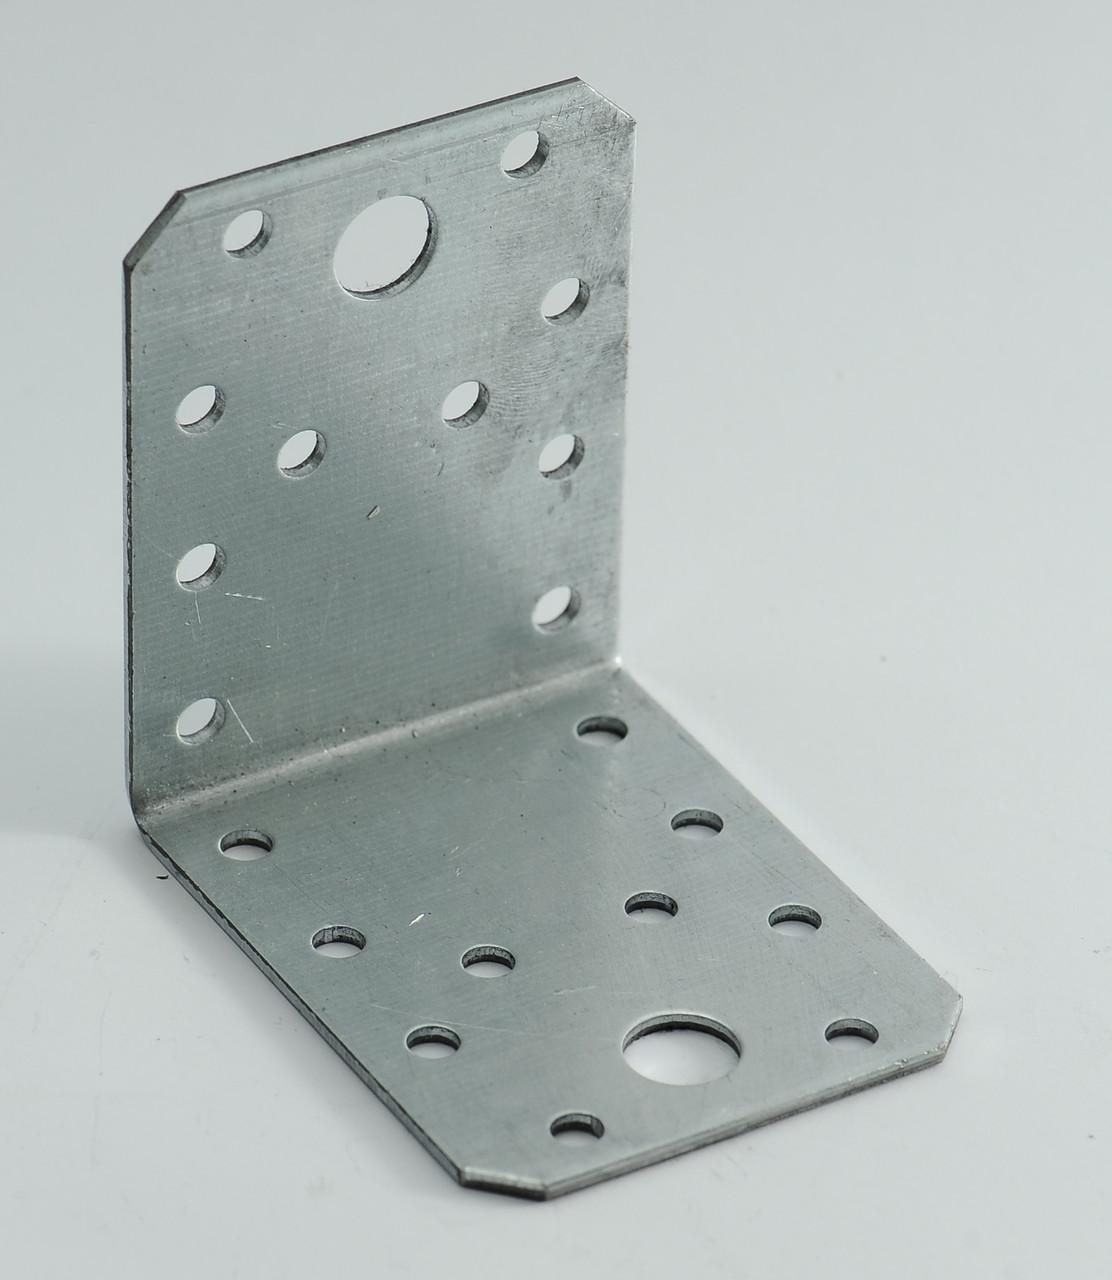 Уголок универсальный 70х70х55 х 1,8 мм